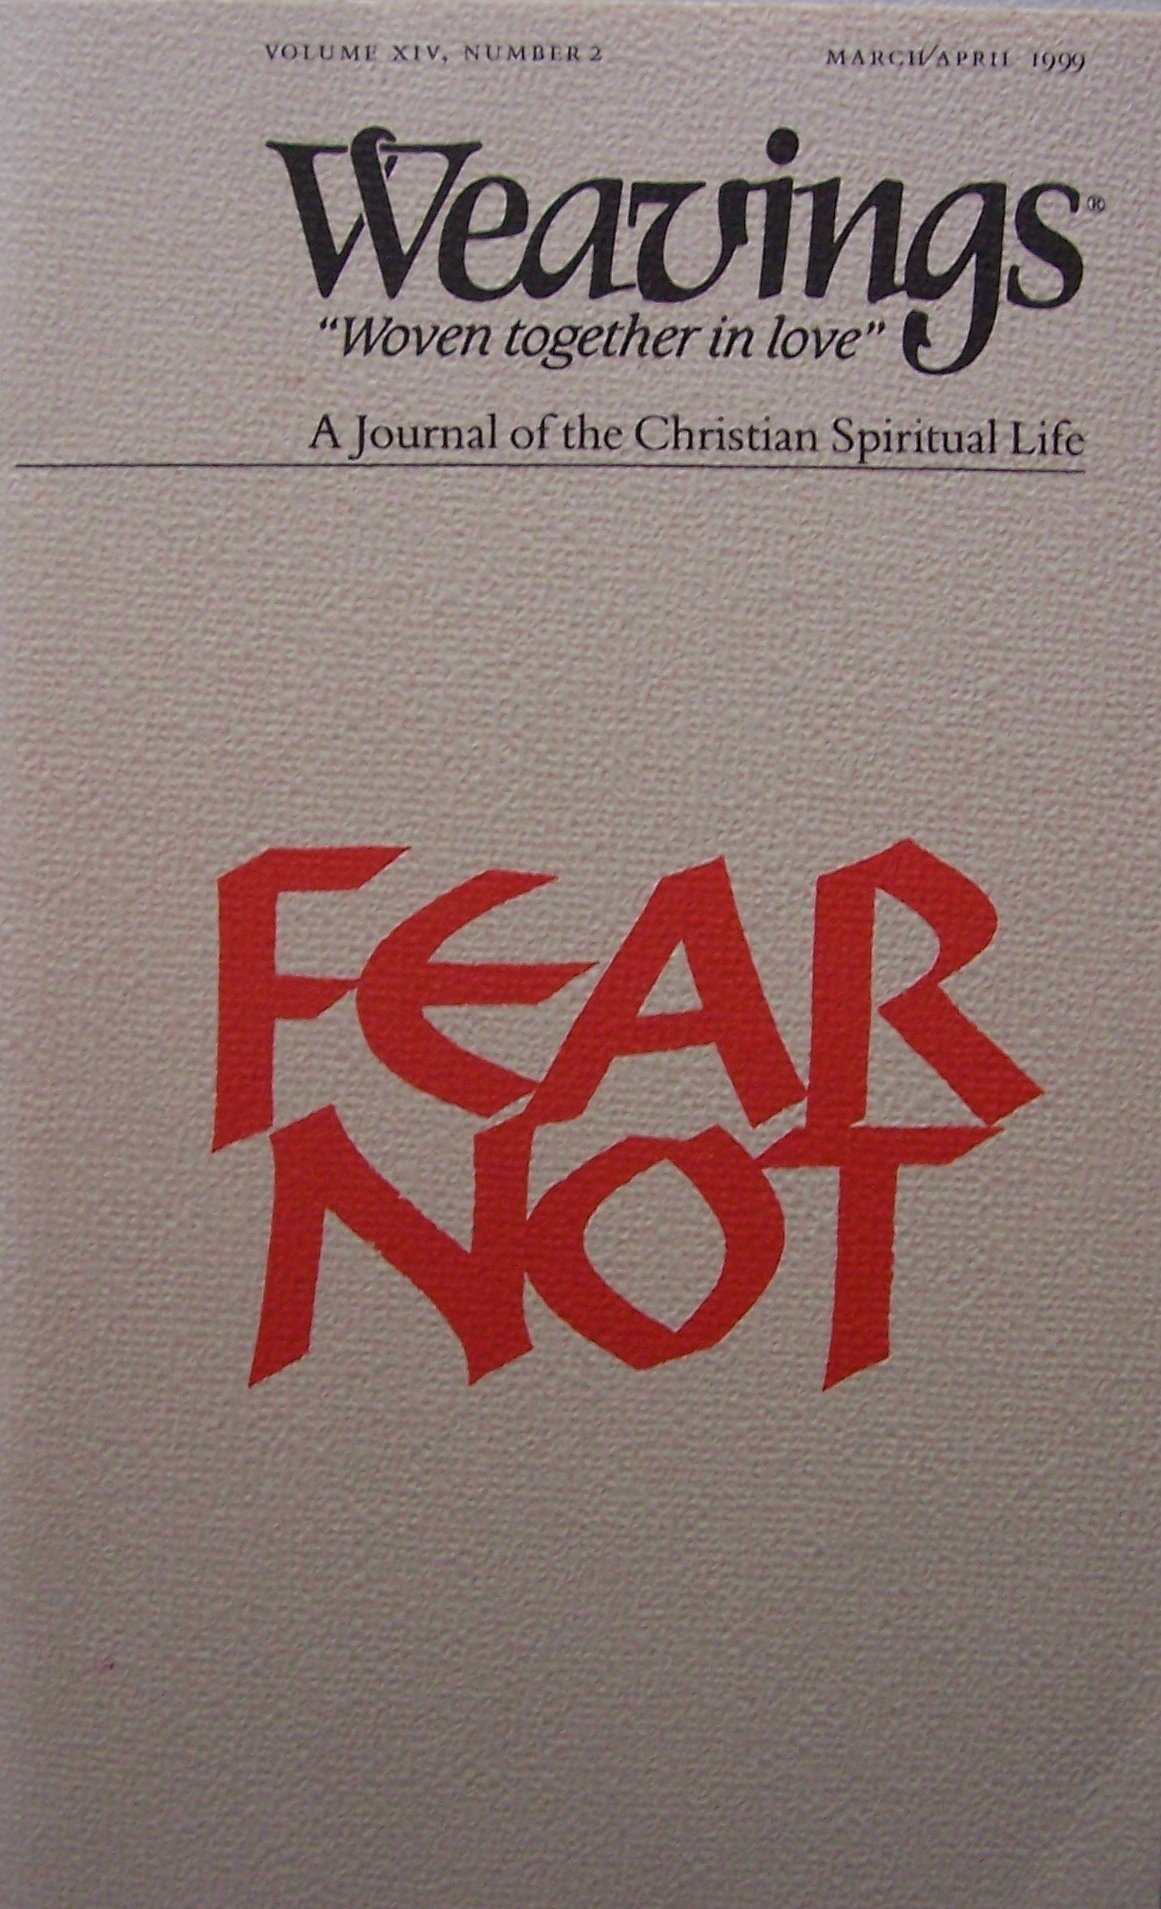 WEAVINGS [ Mar/Apr 1999, Vol. XIV, No. 2 ] Fear Not (A Journal of the Christian Spiritual Life)